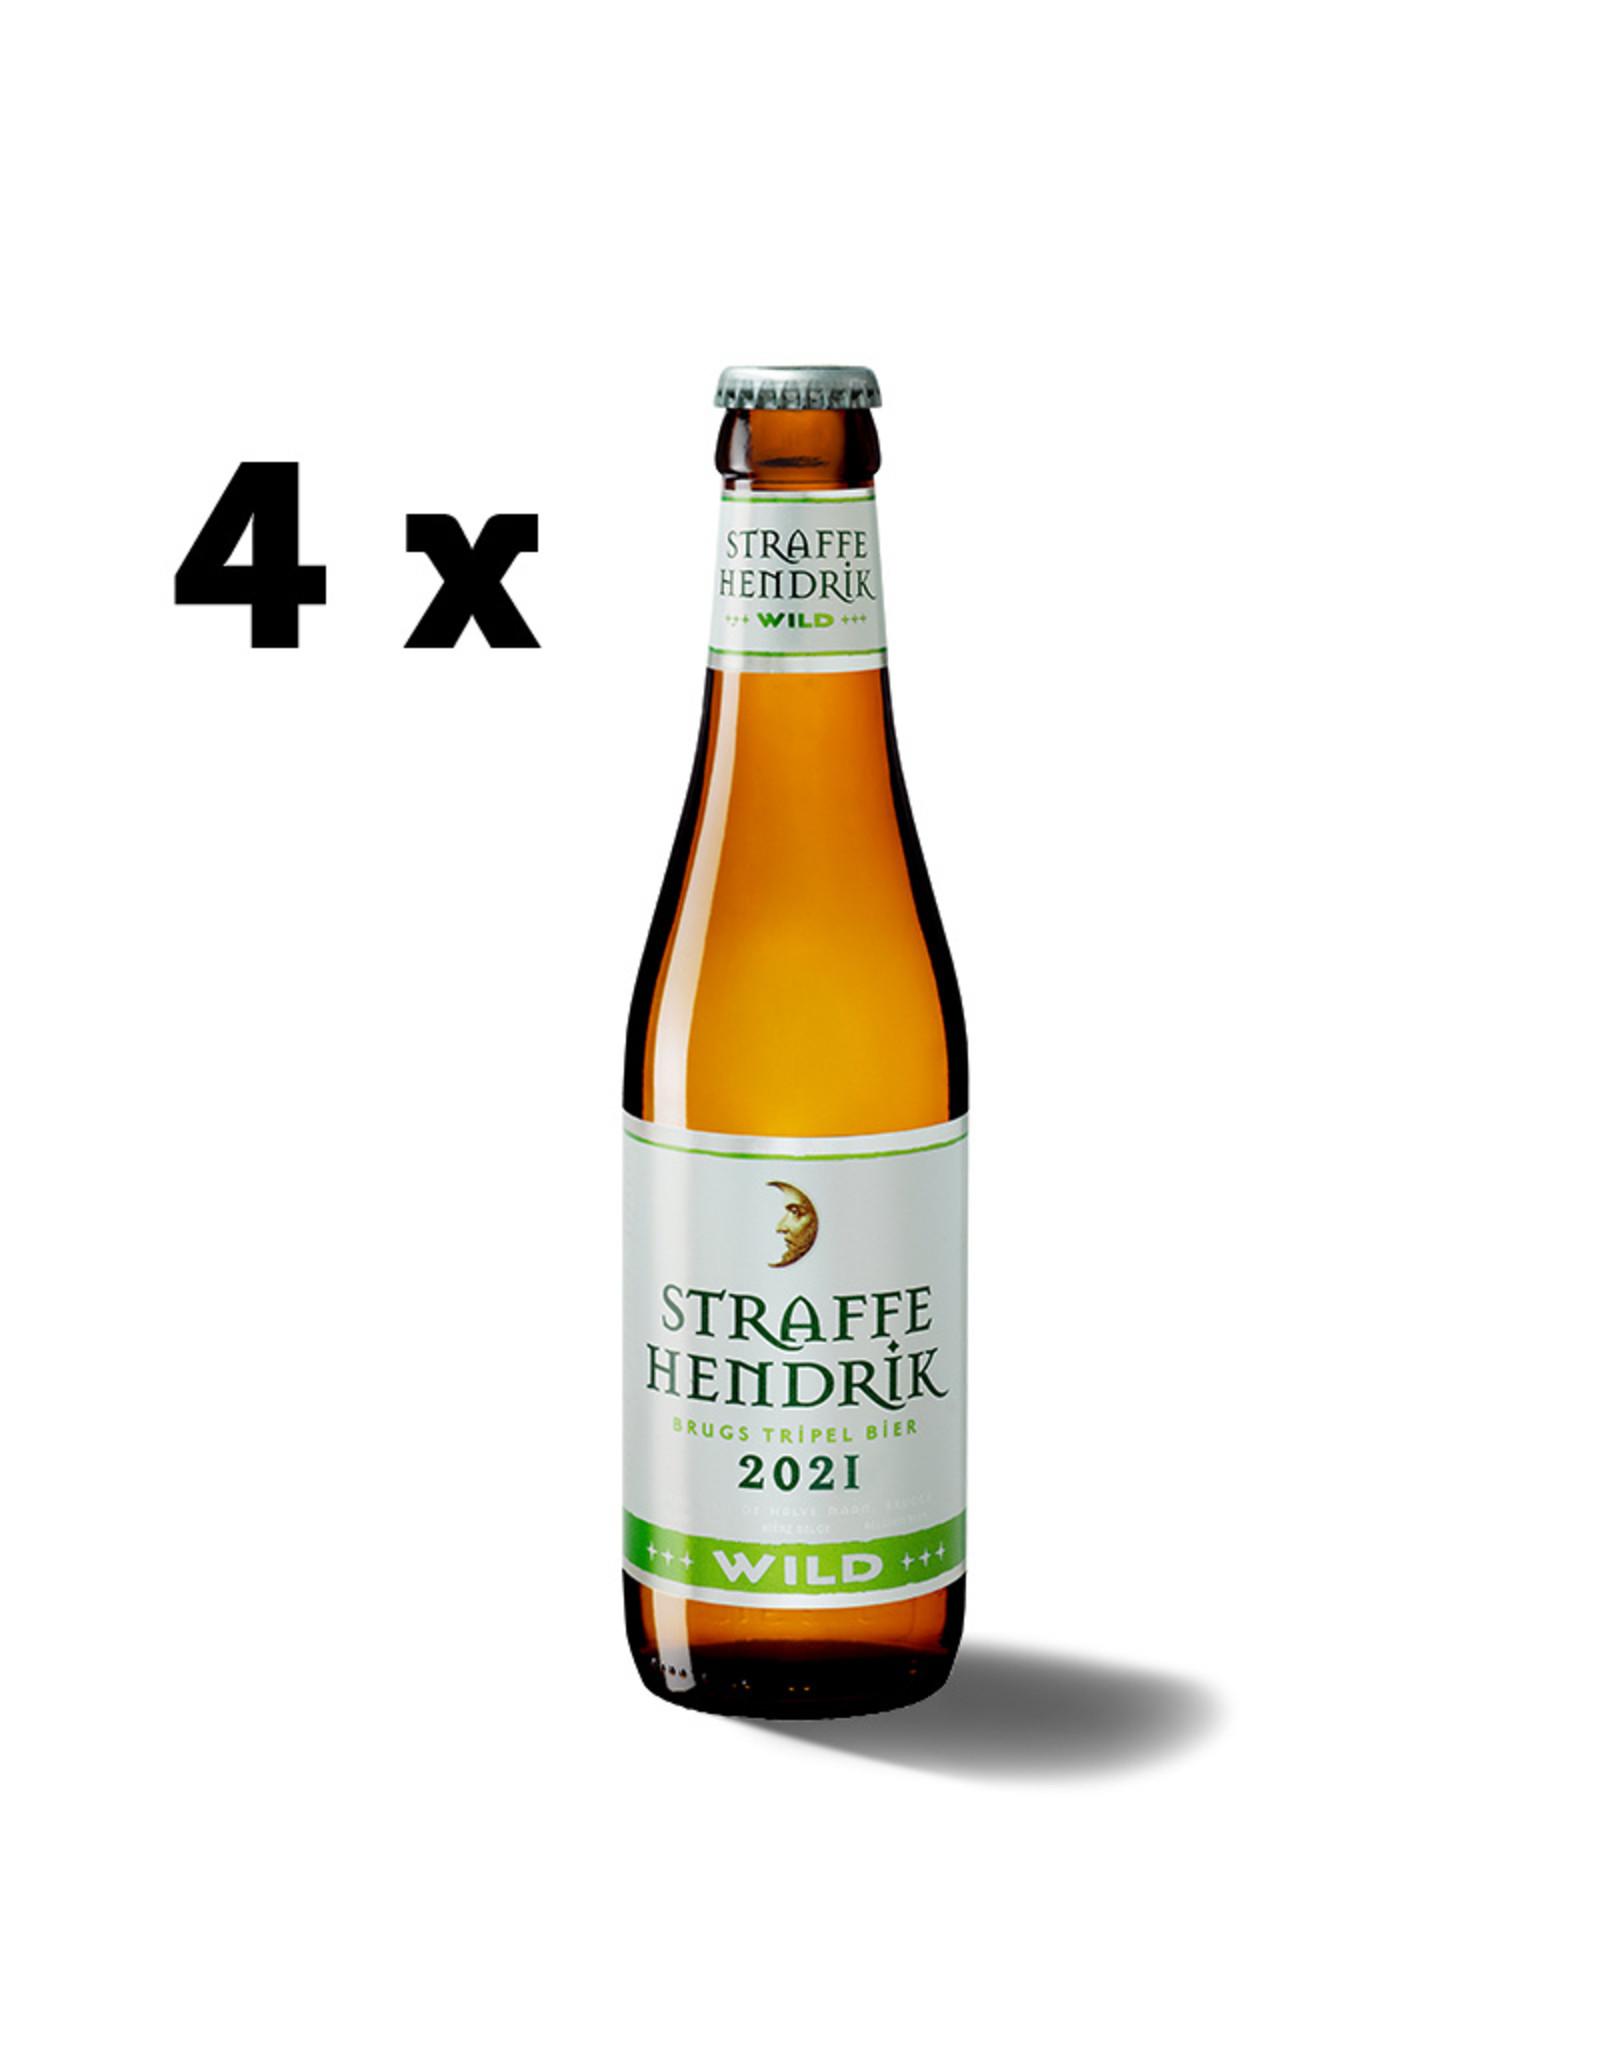 Straffe Hendrik Straffe Hendrik Wild 2021 4 x 33 cl